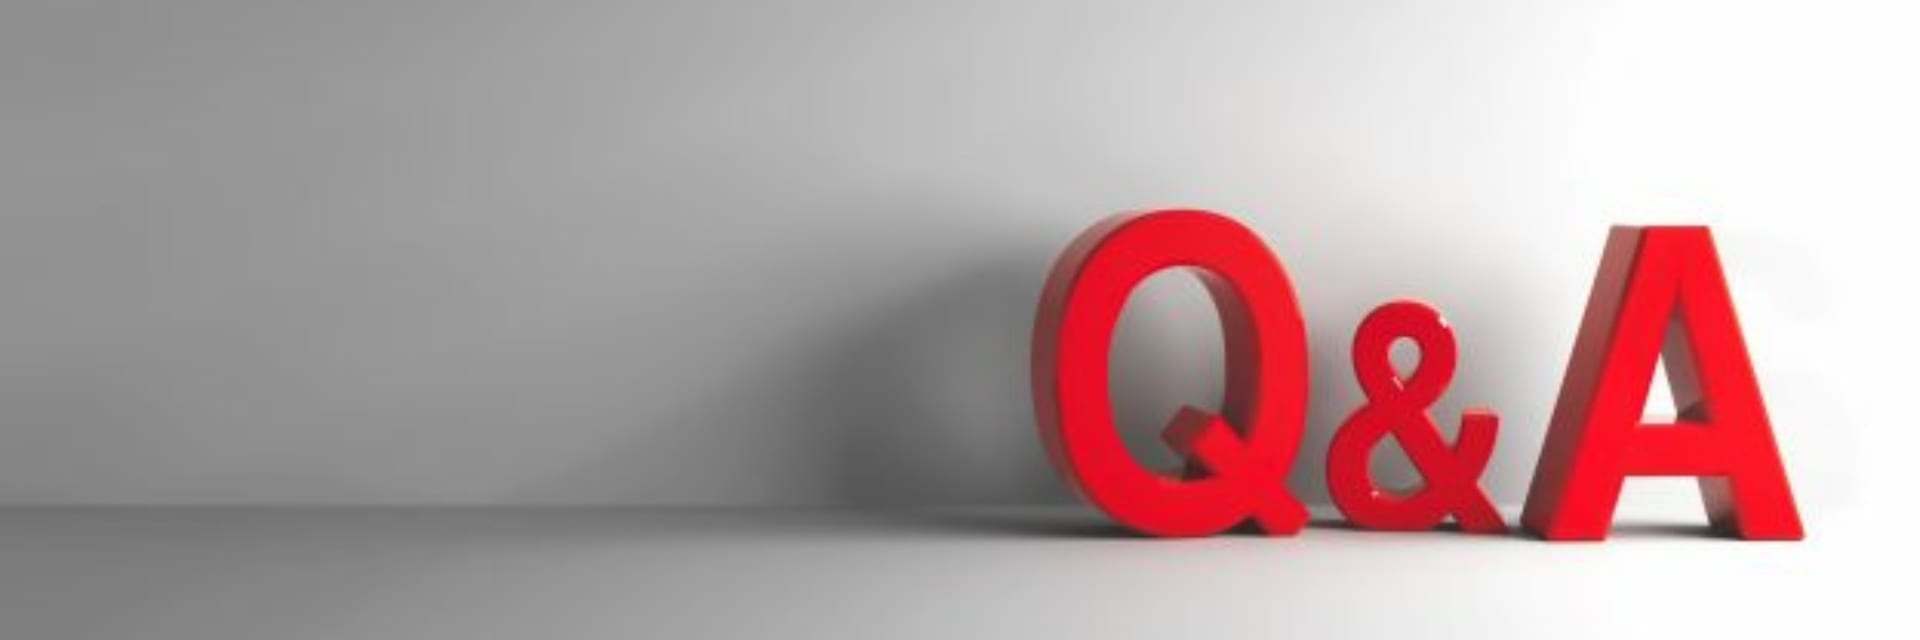 Augmented Analytics Q/A